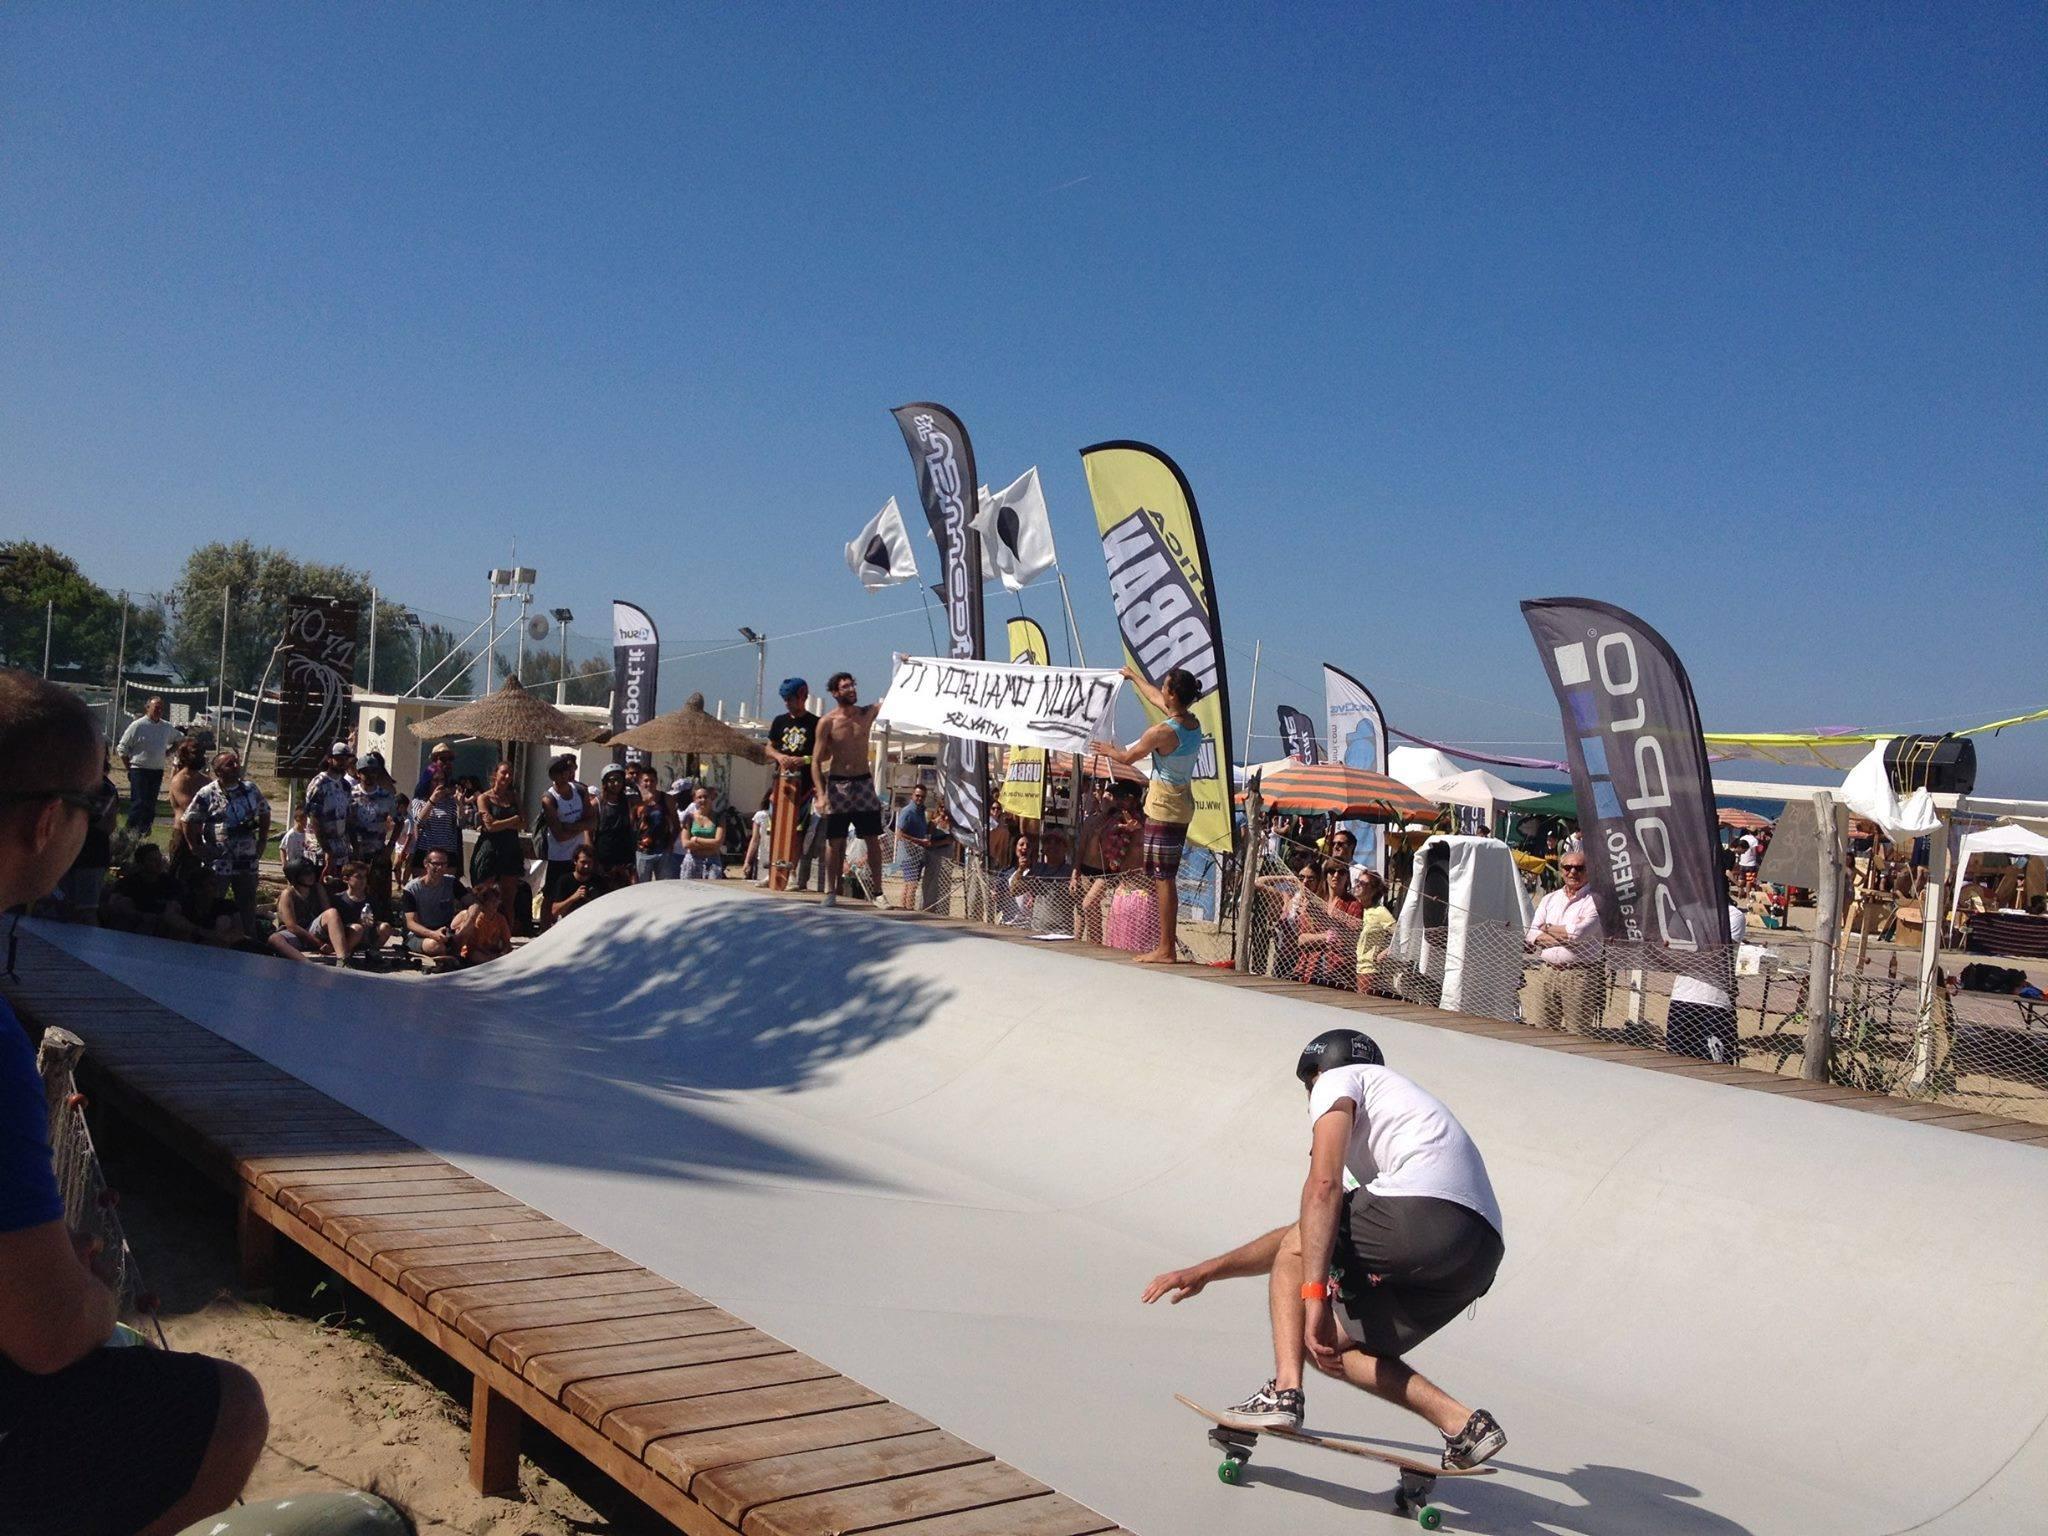 Luca Boari surfing the Whitezu PRO Training surfskate spot at Soul Hands Festival